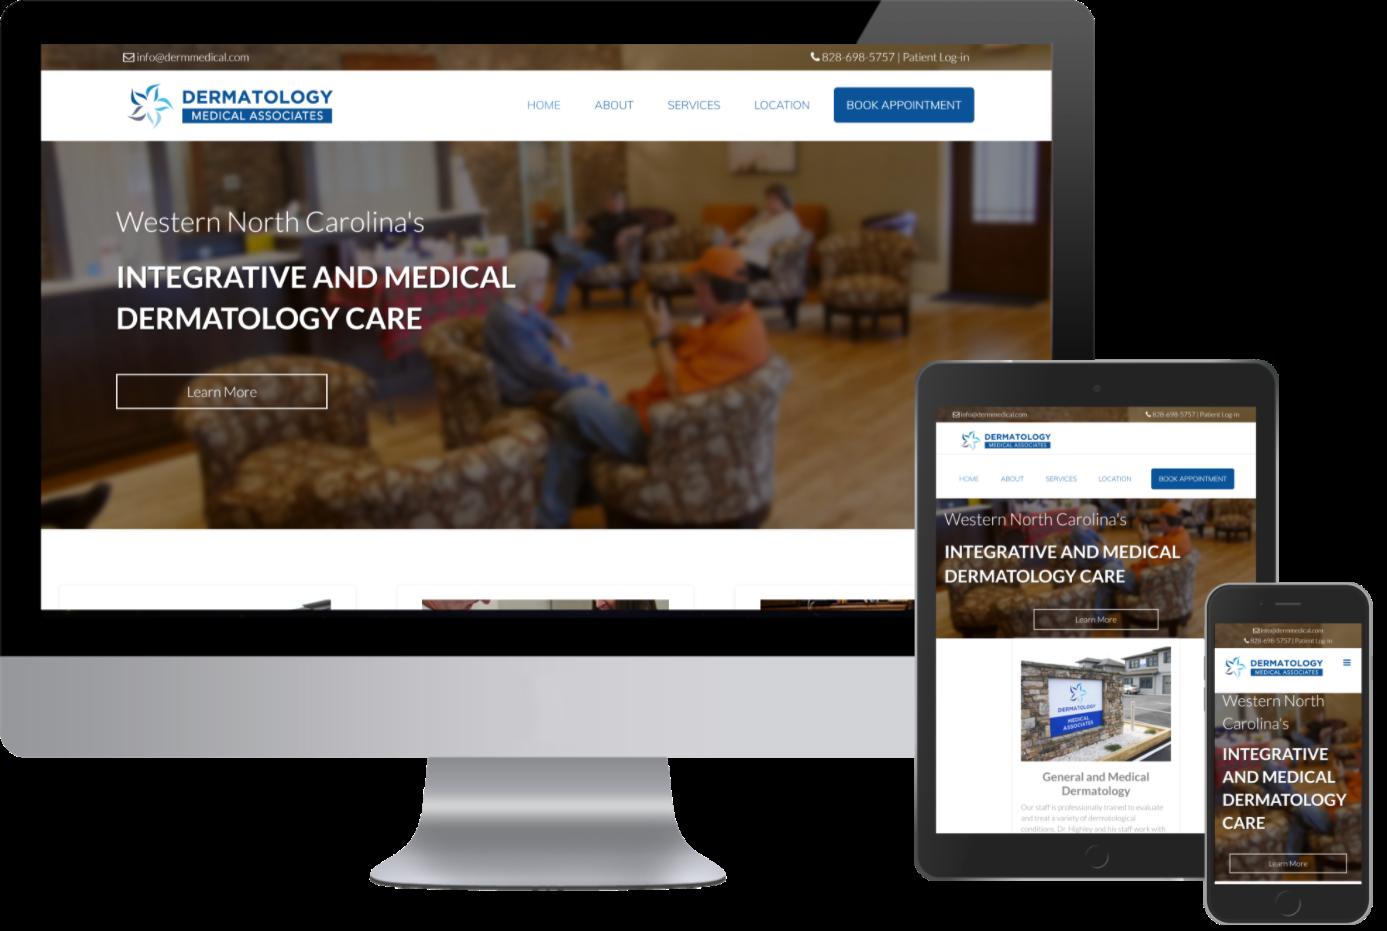 Dermatology Medical Associates now has a Responsive website